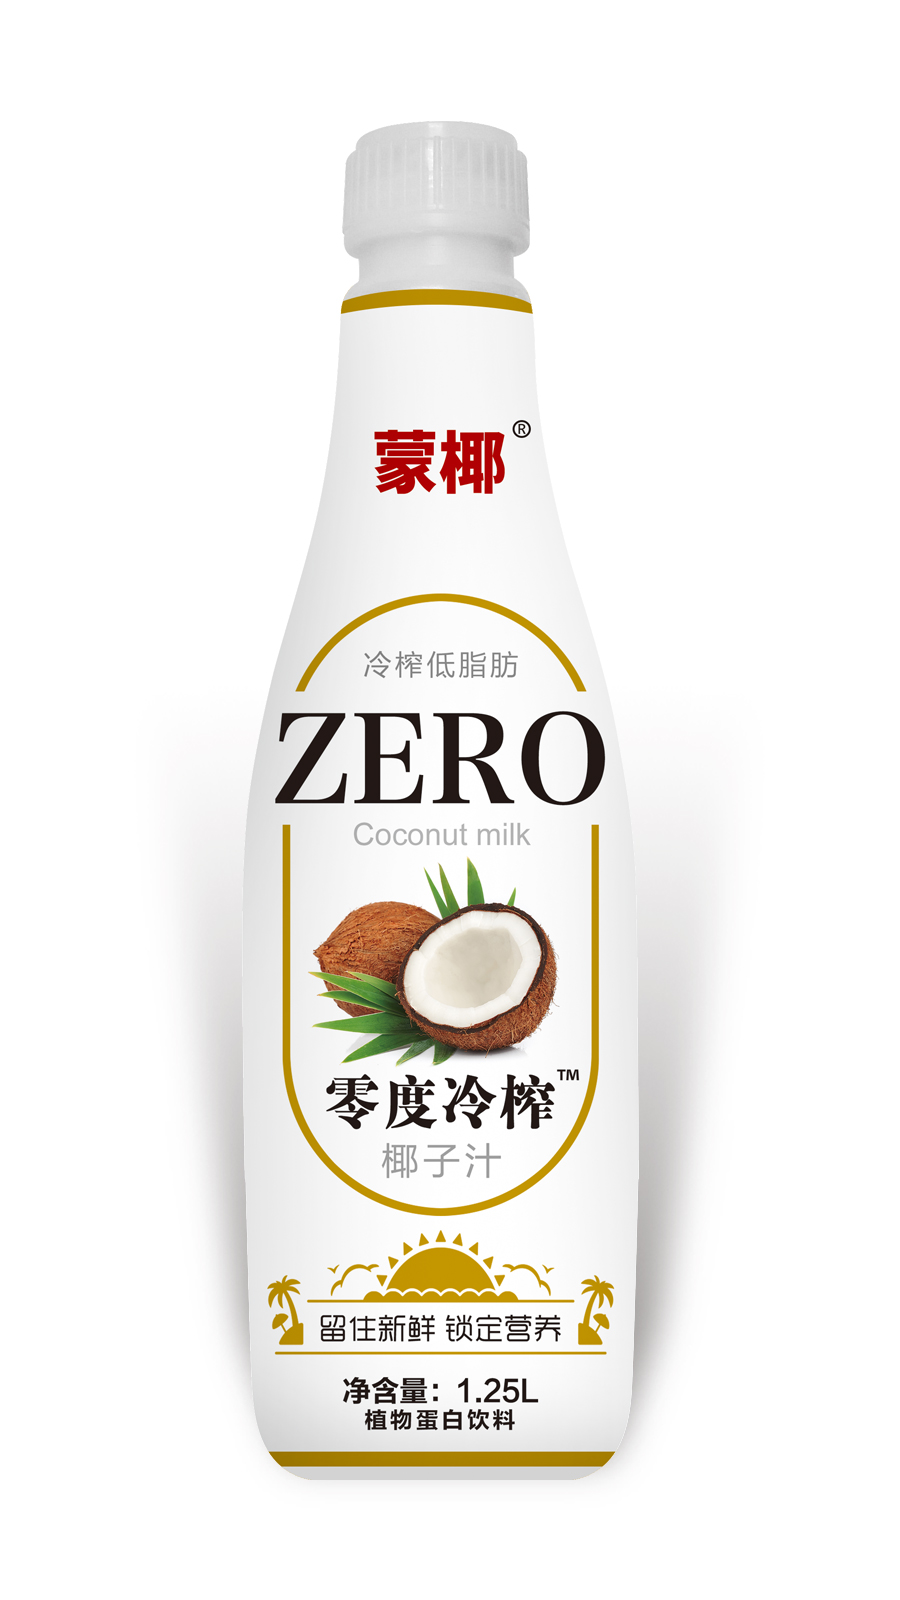 1.25L蒙椰 零度冷榨椰子汁